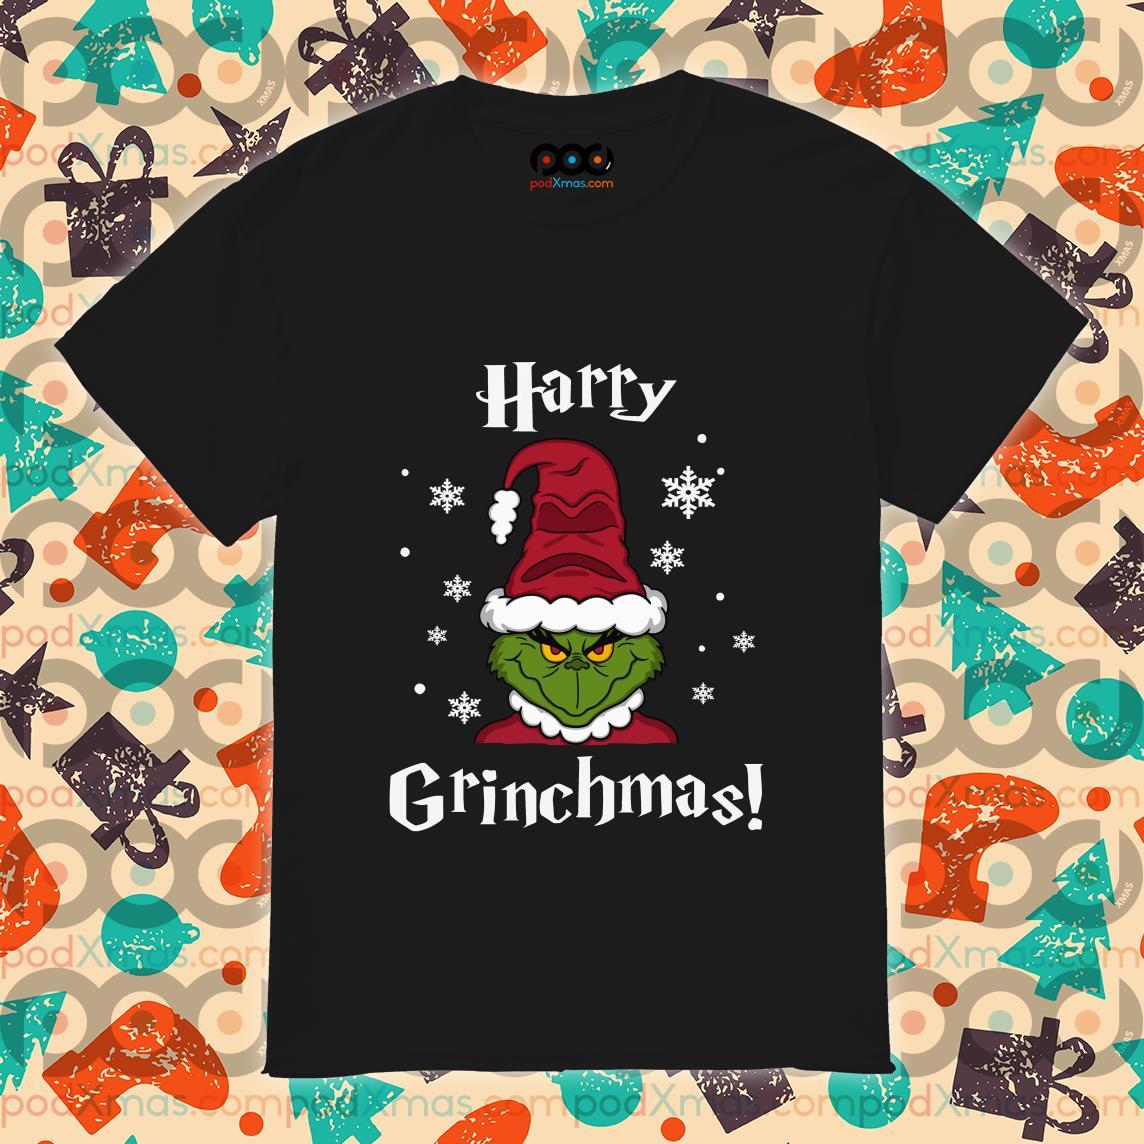 Harry Grinchmas Sorting Hat shirt